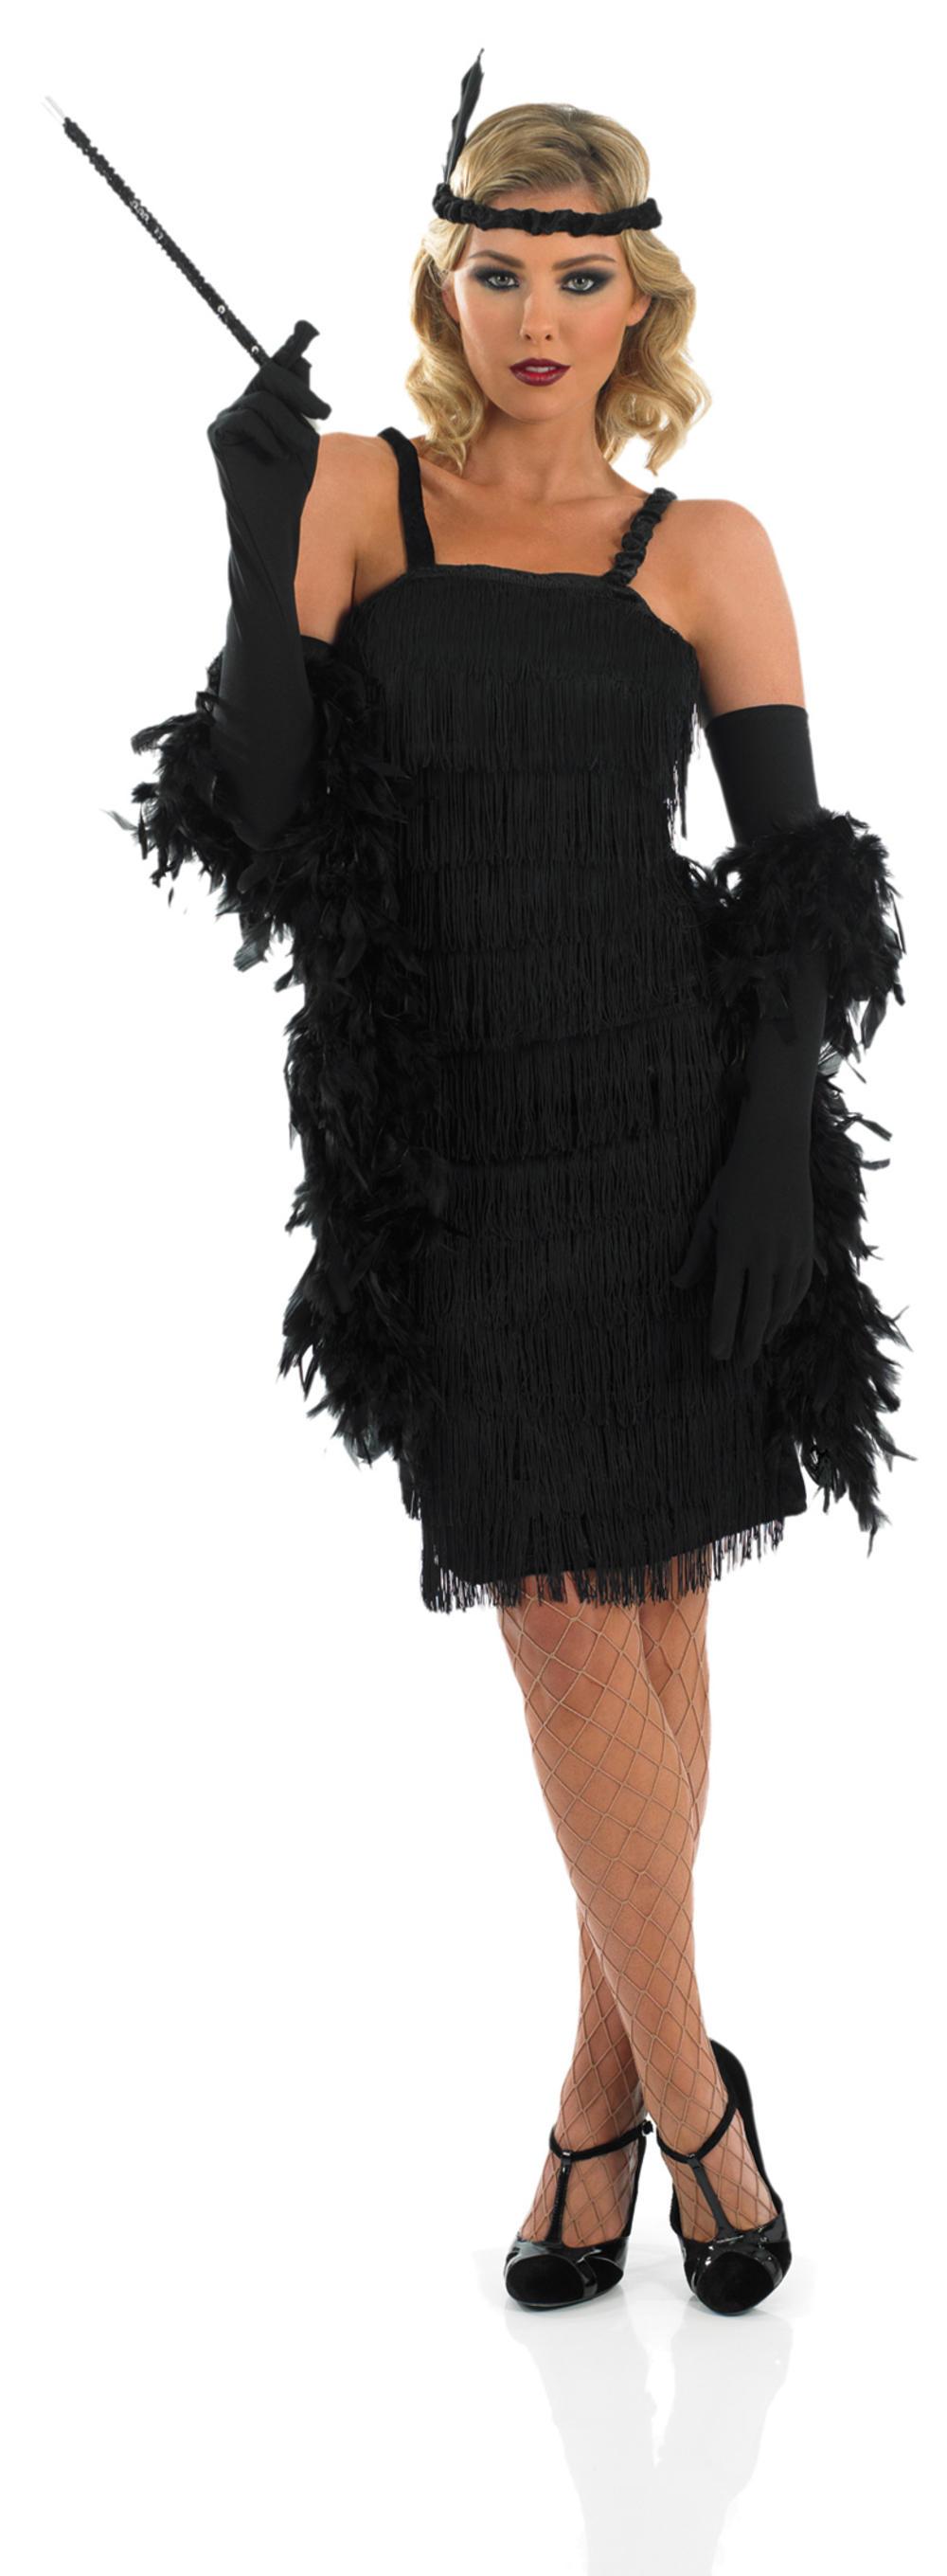 Black 1920s Flapper Dress Charleston Ladies Fancy Dress 20s Costume Outfit 8-30